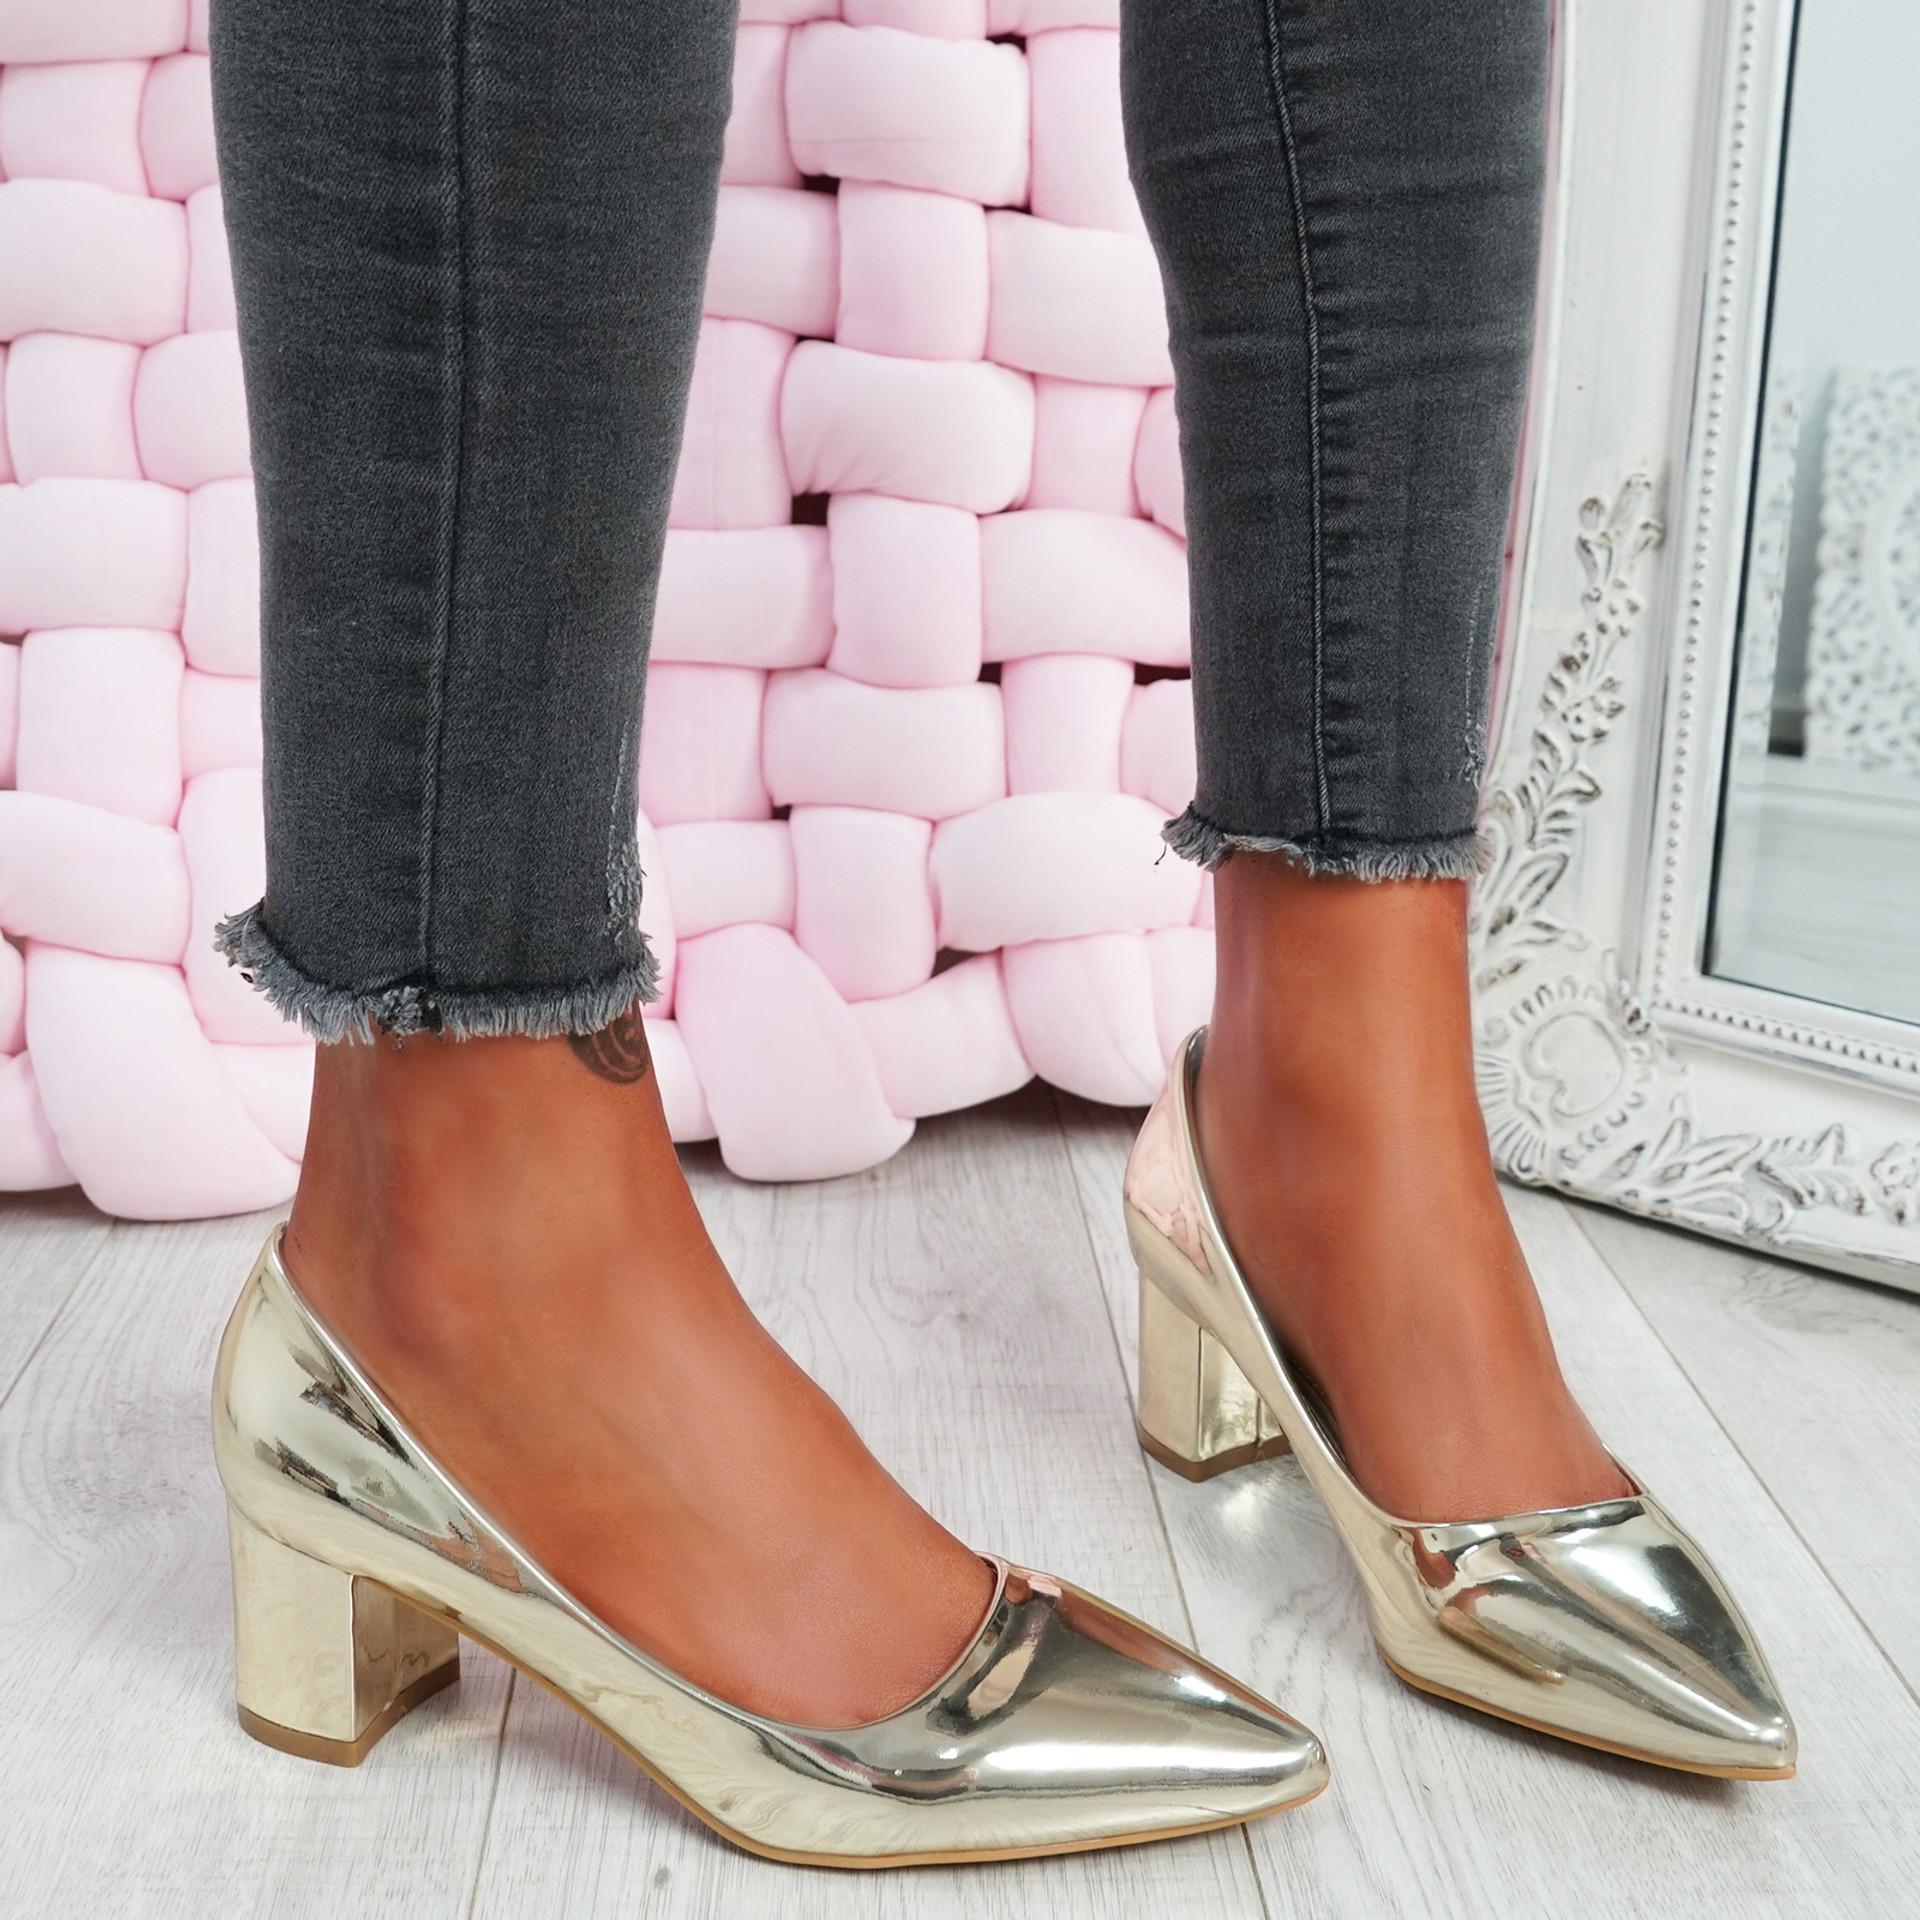 Nya Gold Block Heel Pumps